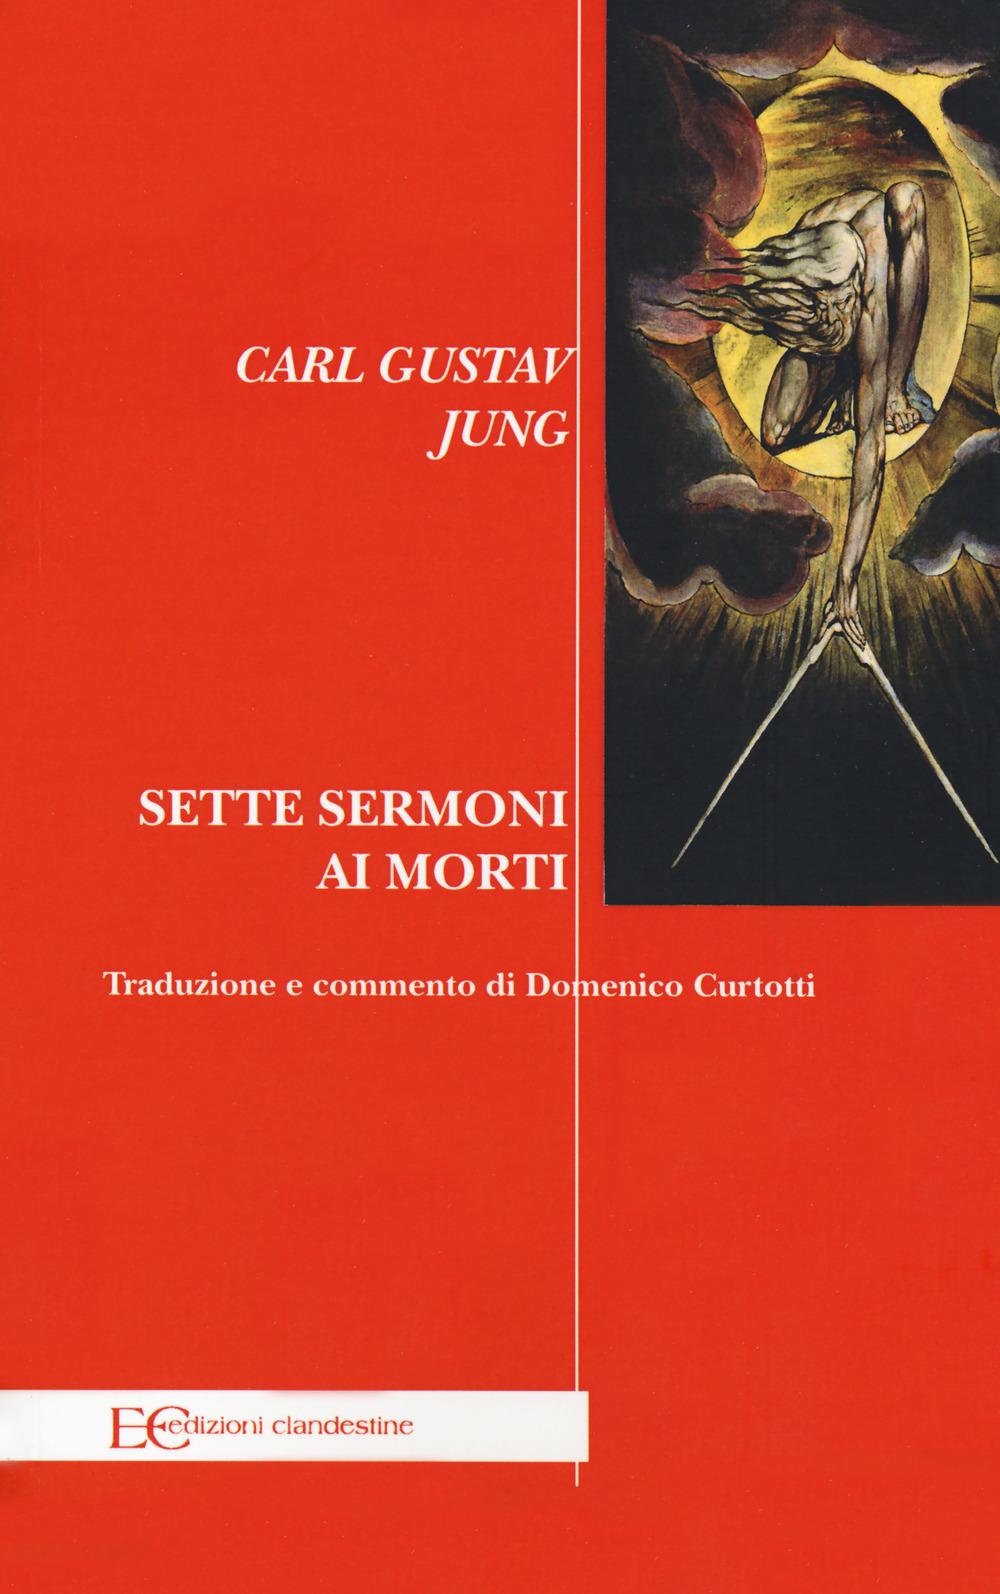 SETTE SERMONI AI MORTI - Jung Carl Gustav - 9788865969069